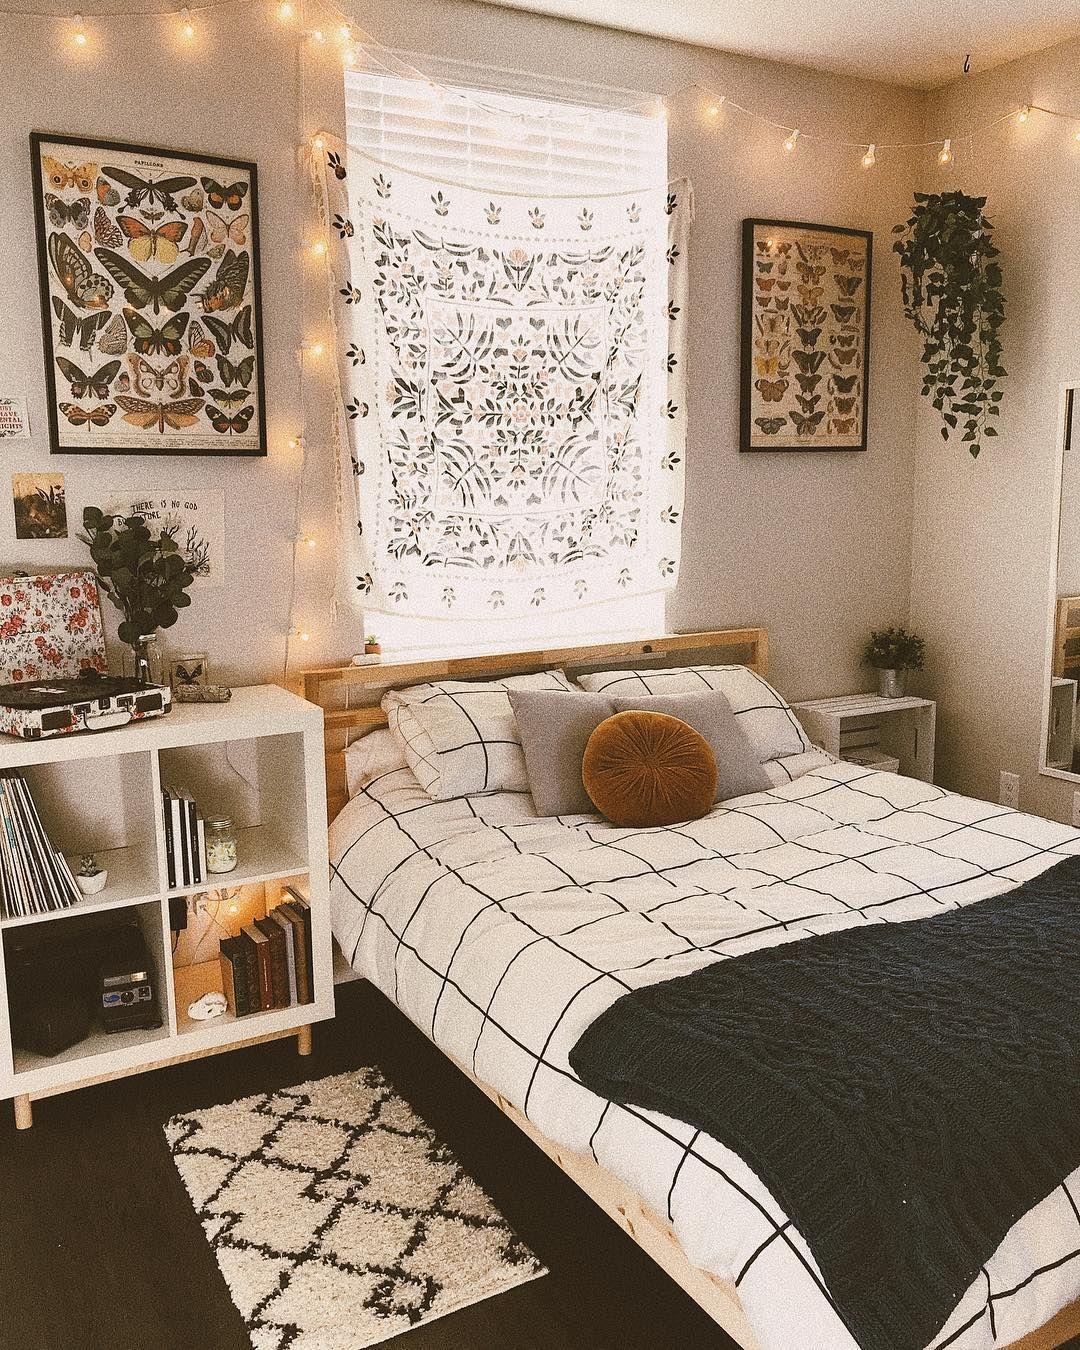 DIY Cozy Small Bedroom Decorating Ideas on budget